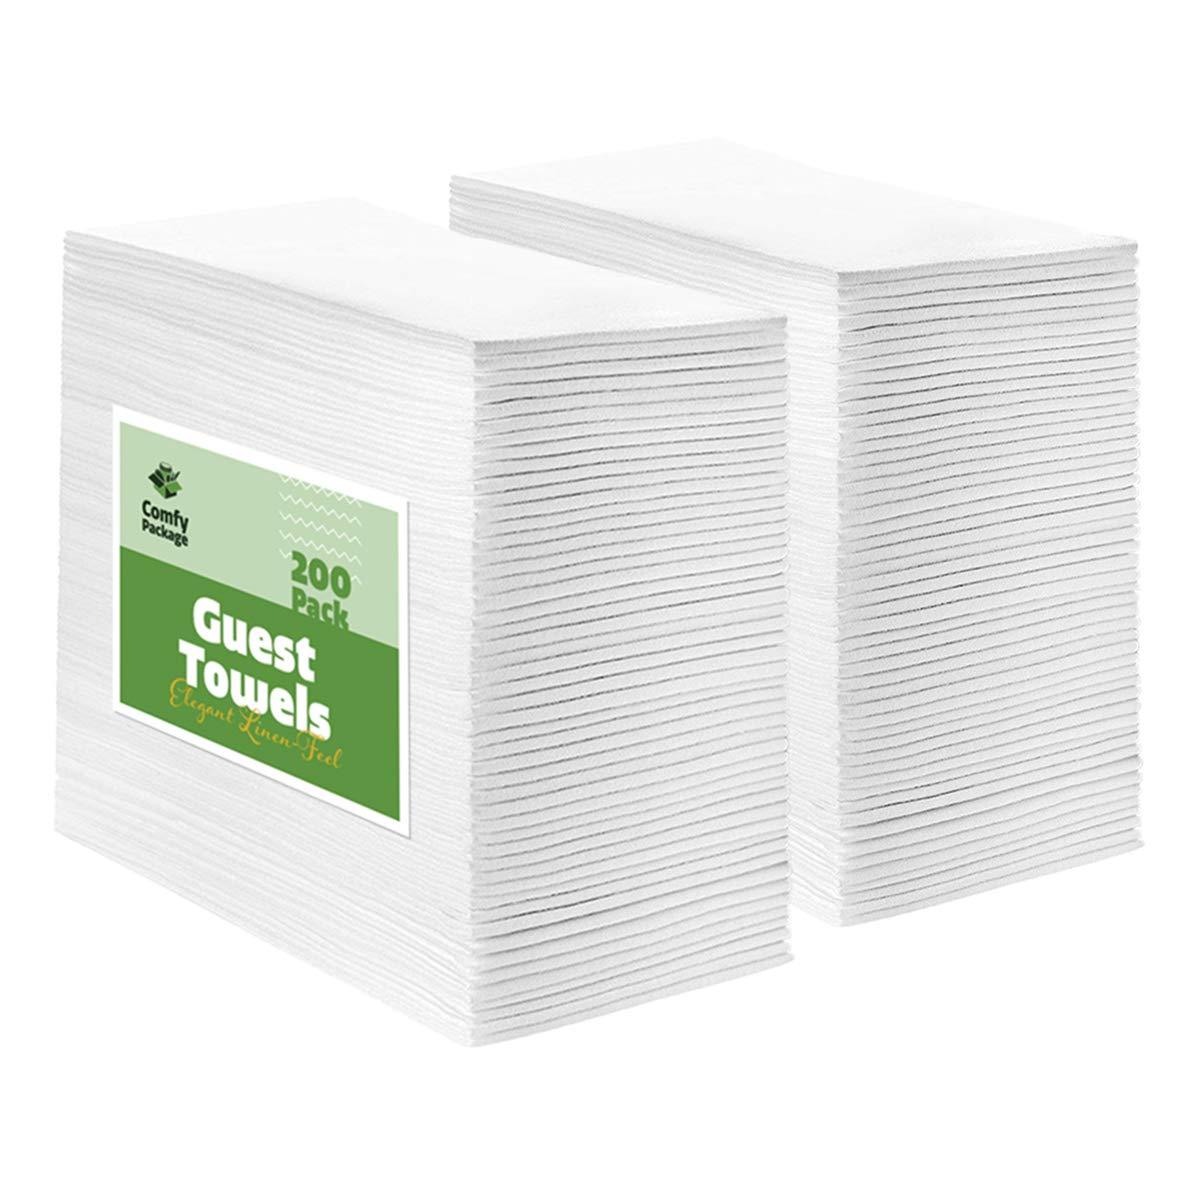 [200 Pack] Linen-Feel Guest Towels - Disposable Cloth Dinner Napkins, Bathroom Paper Towels